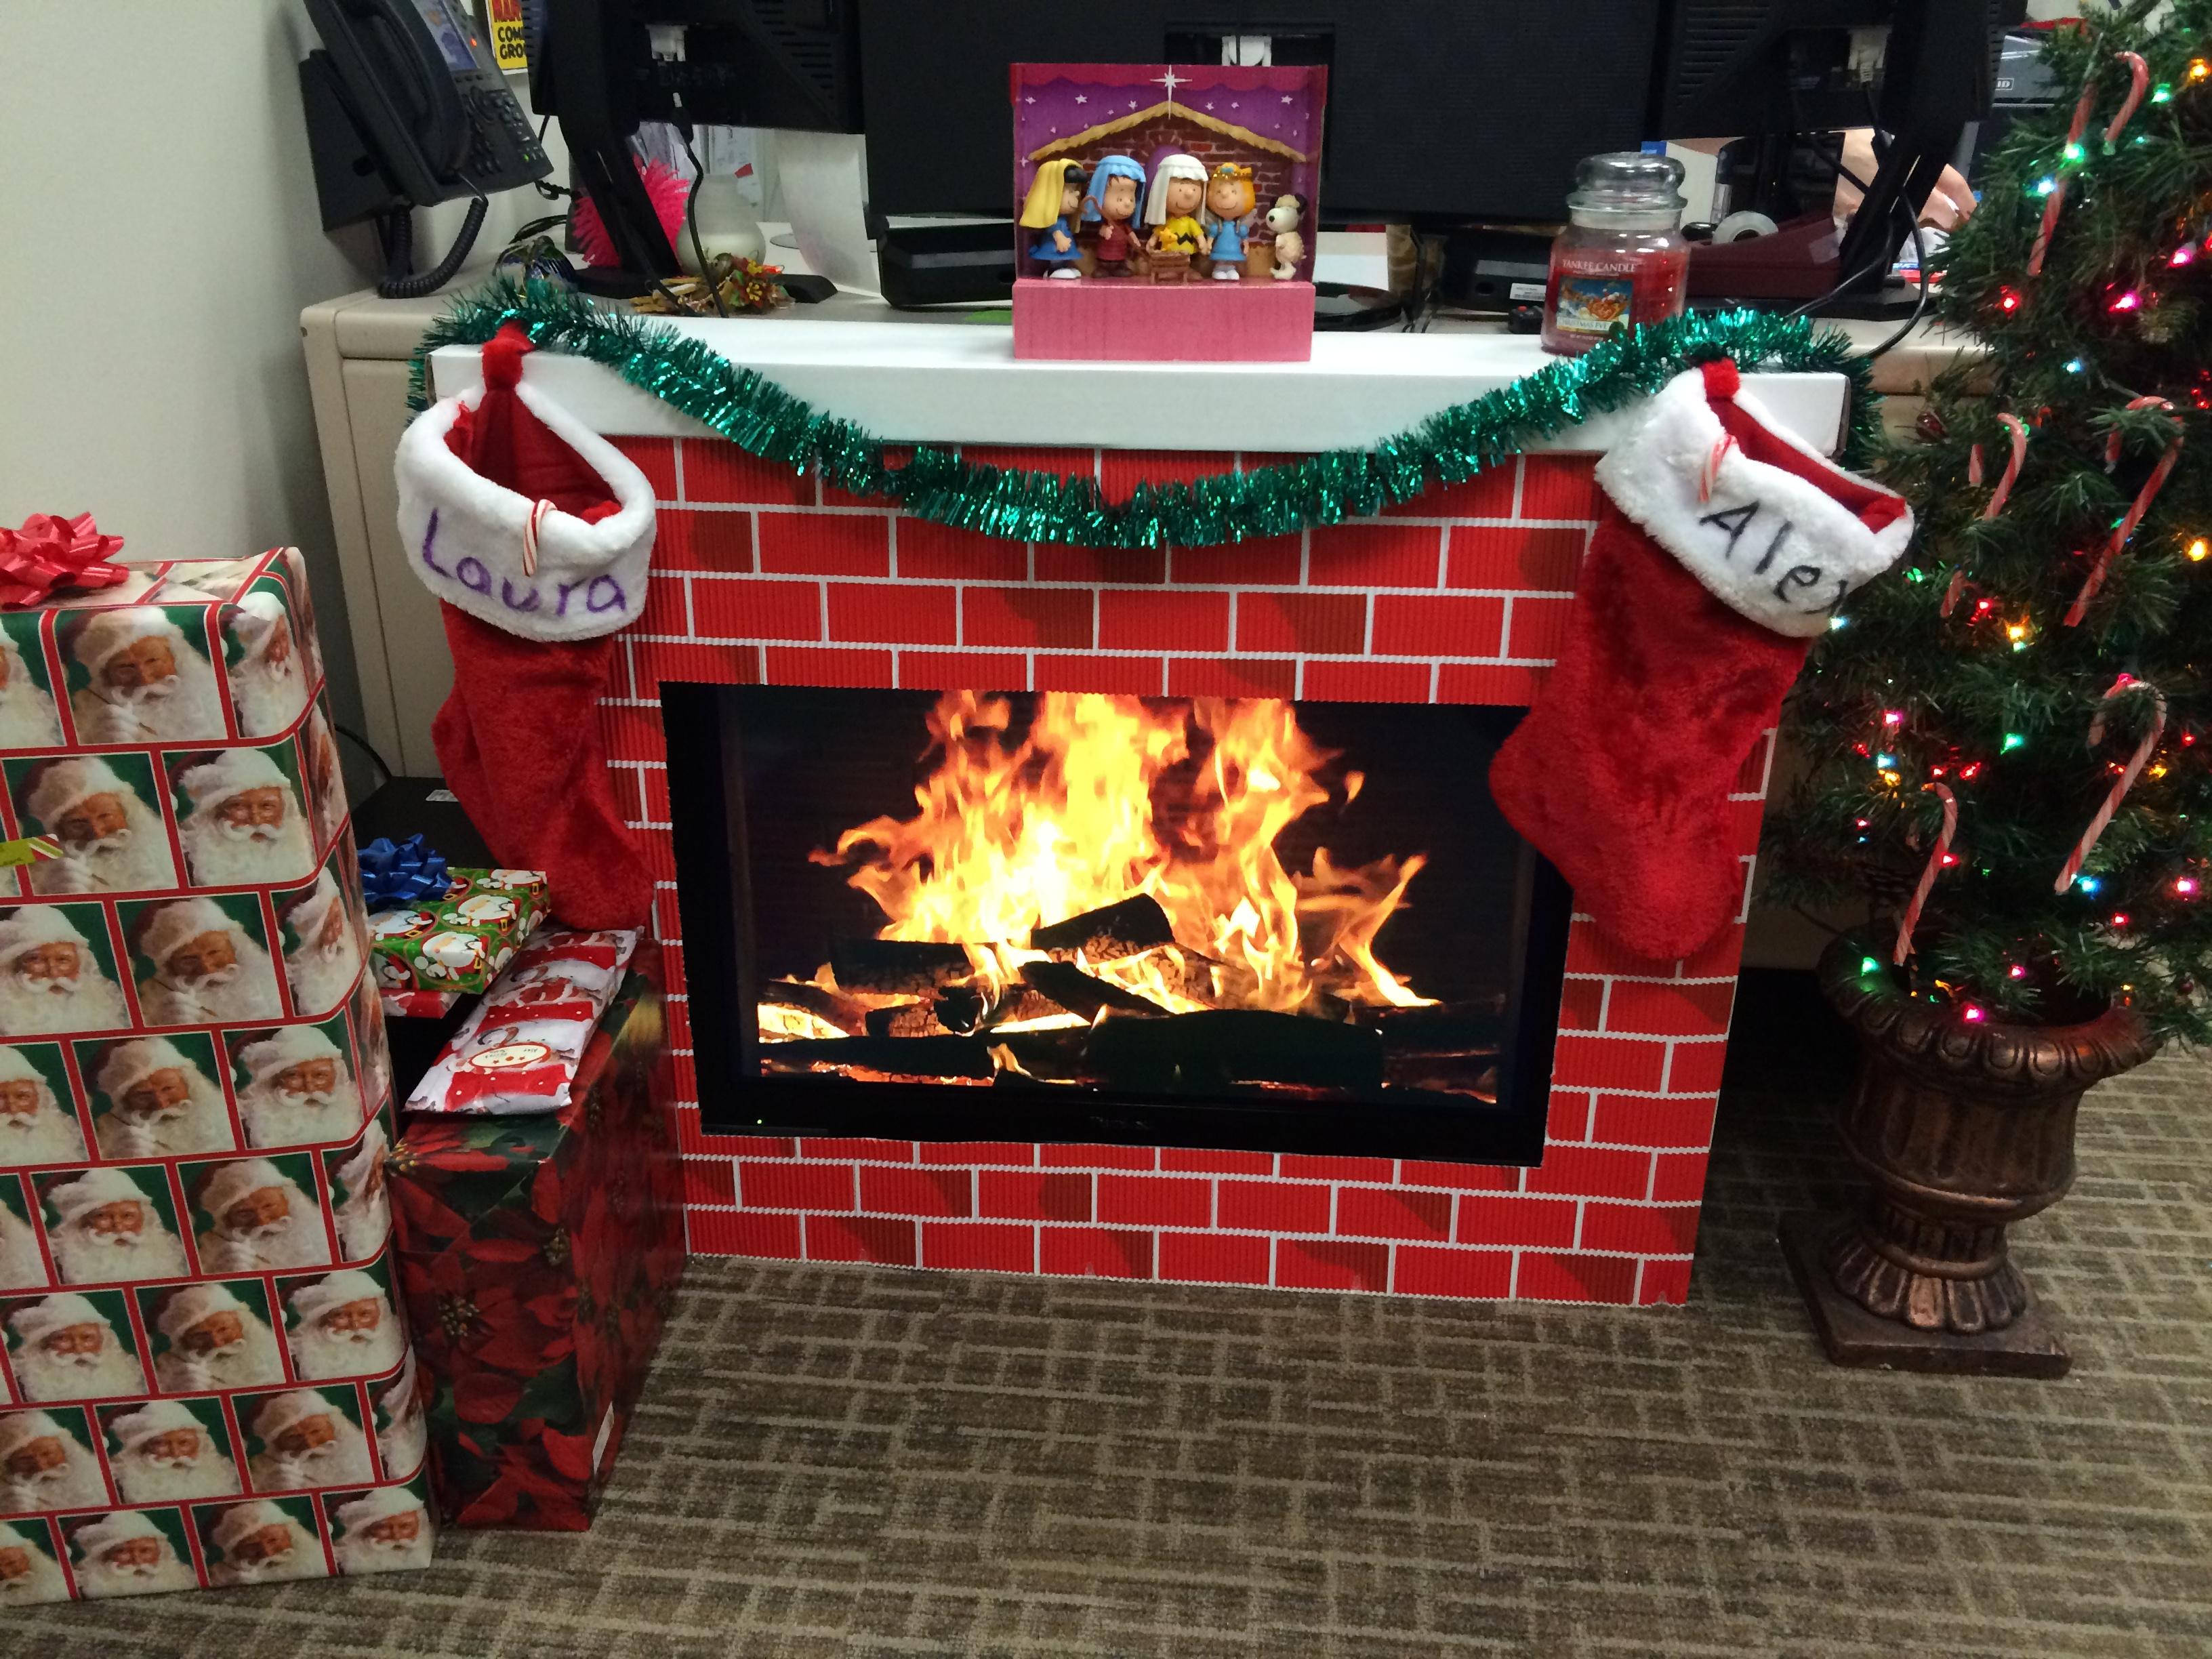 Reminiscing of the Holiday Season at Emery & Webb